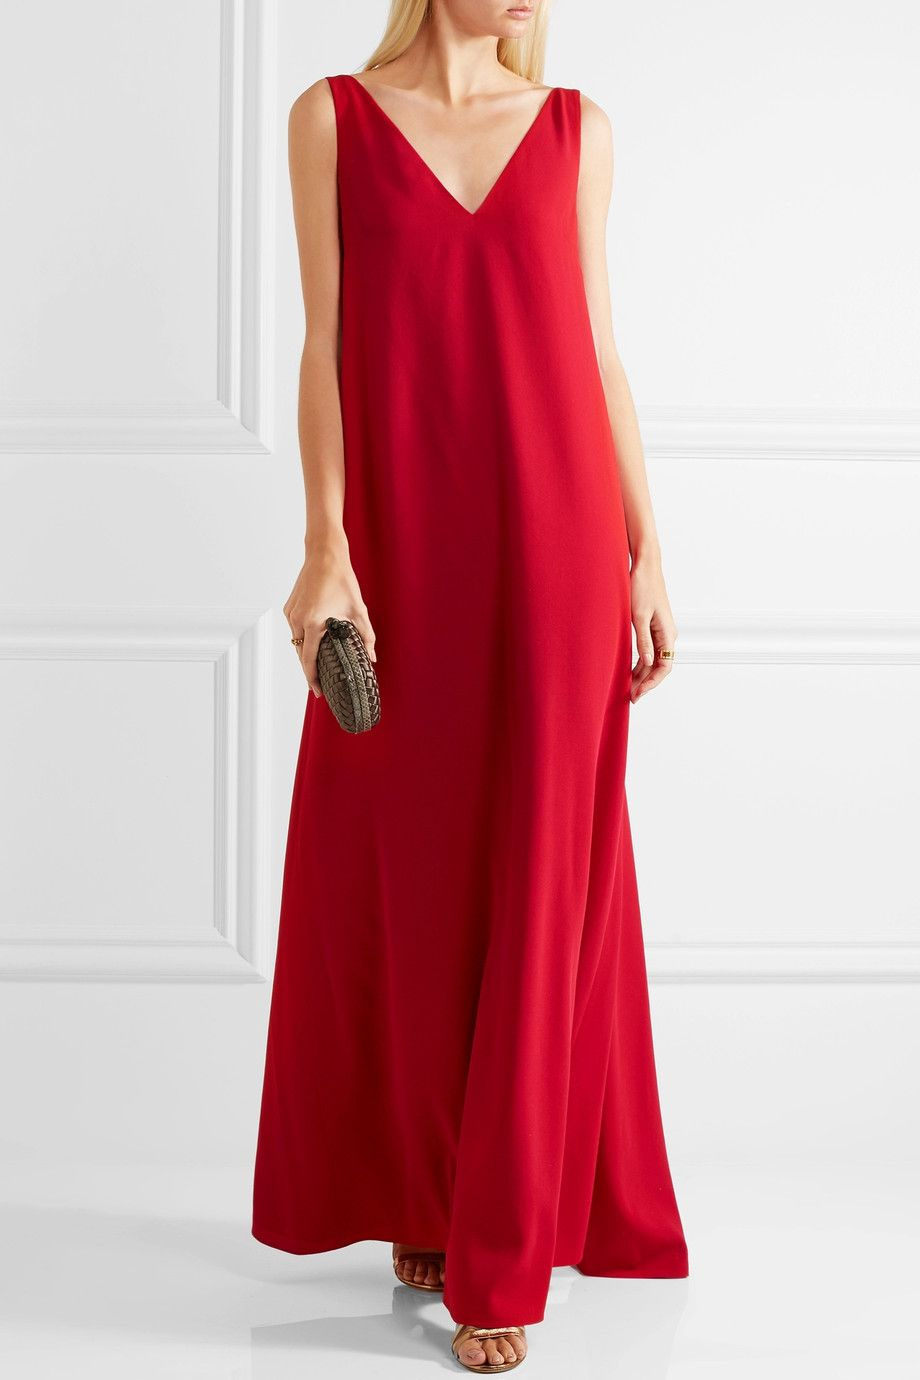 Valentino | Draped wool-crepe gown | NET-A-PORTER.COM | šití - šaty ...